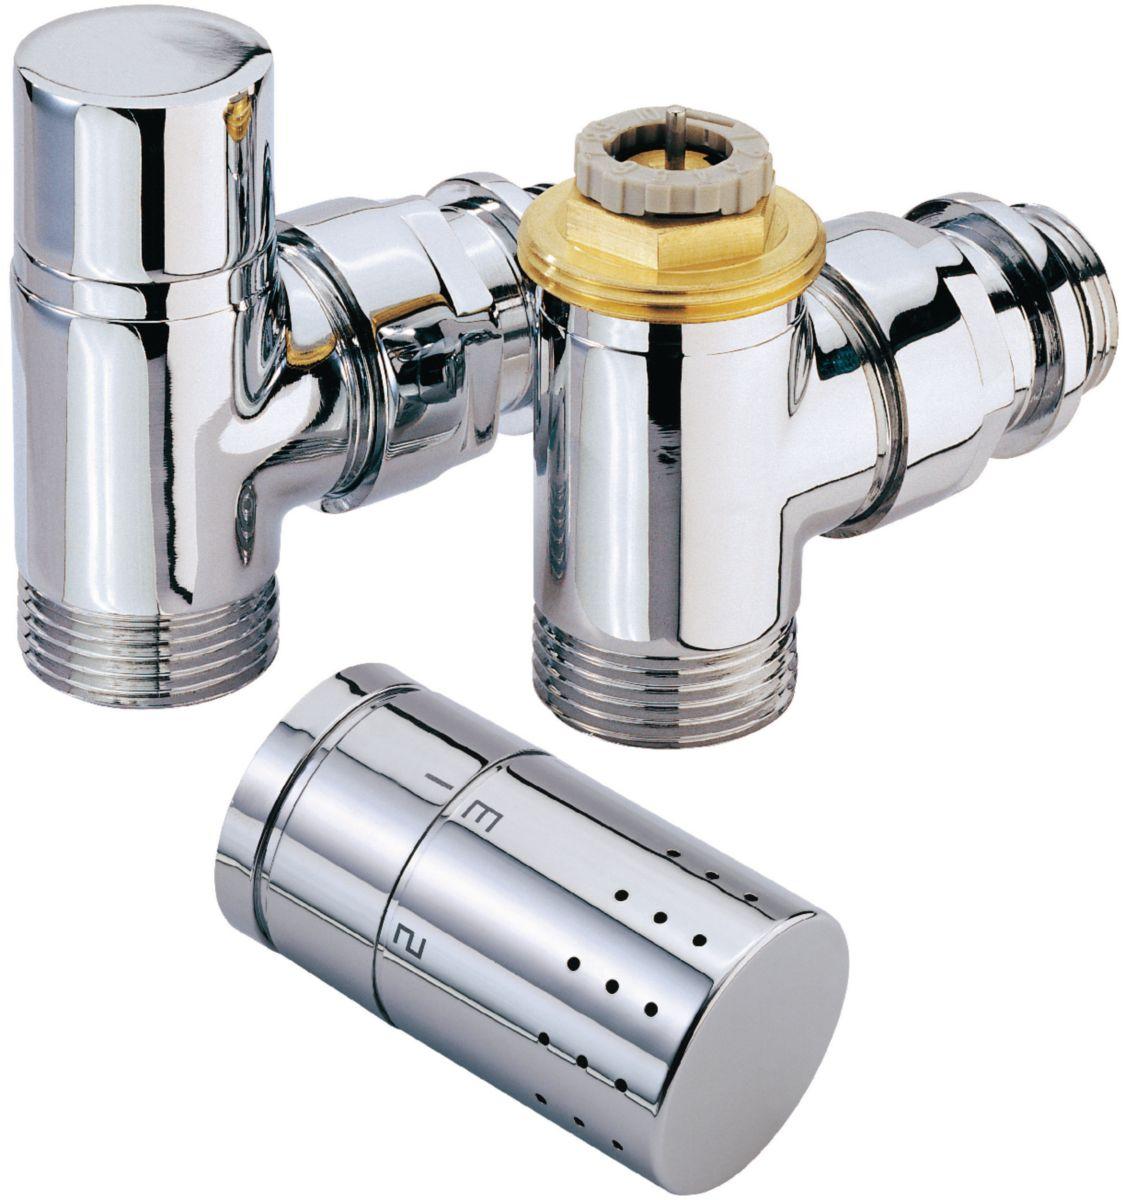 kit robinet radiateur thermostatique design chromé alterna ... - Robinet Thermostatique Seche Serviette